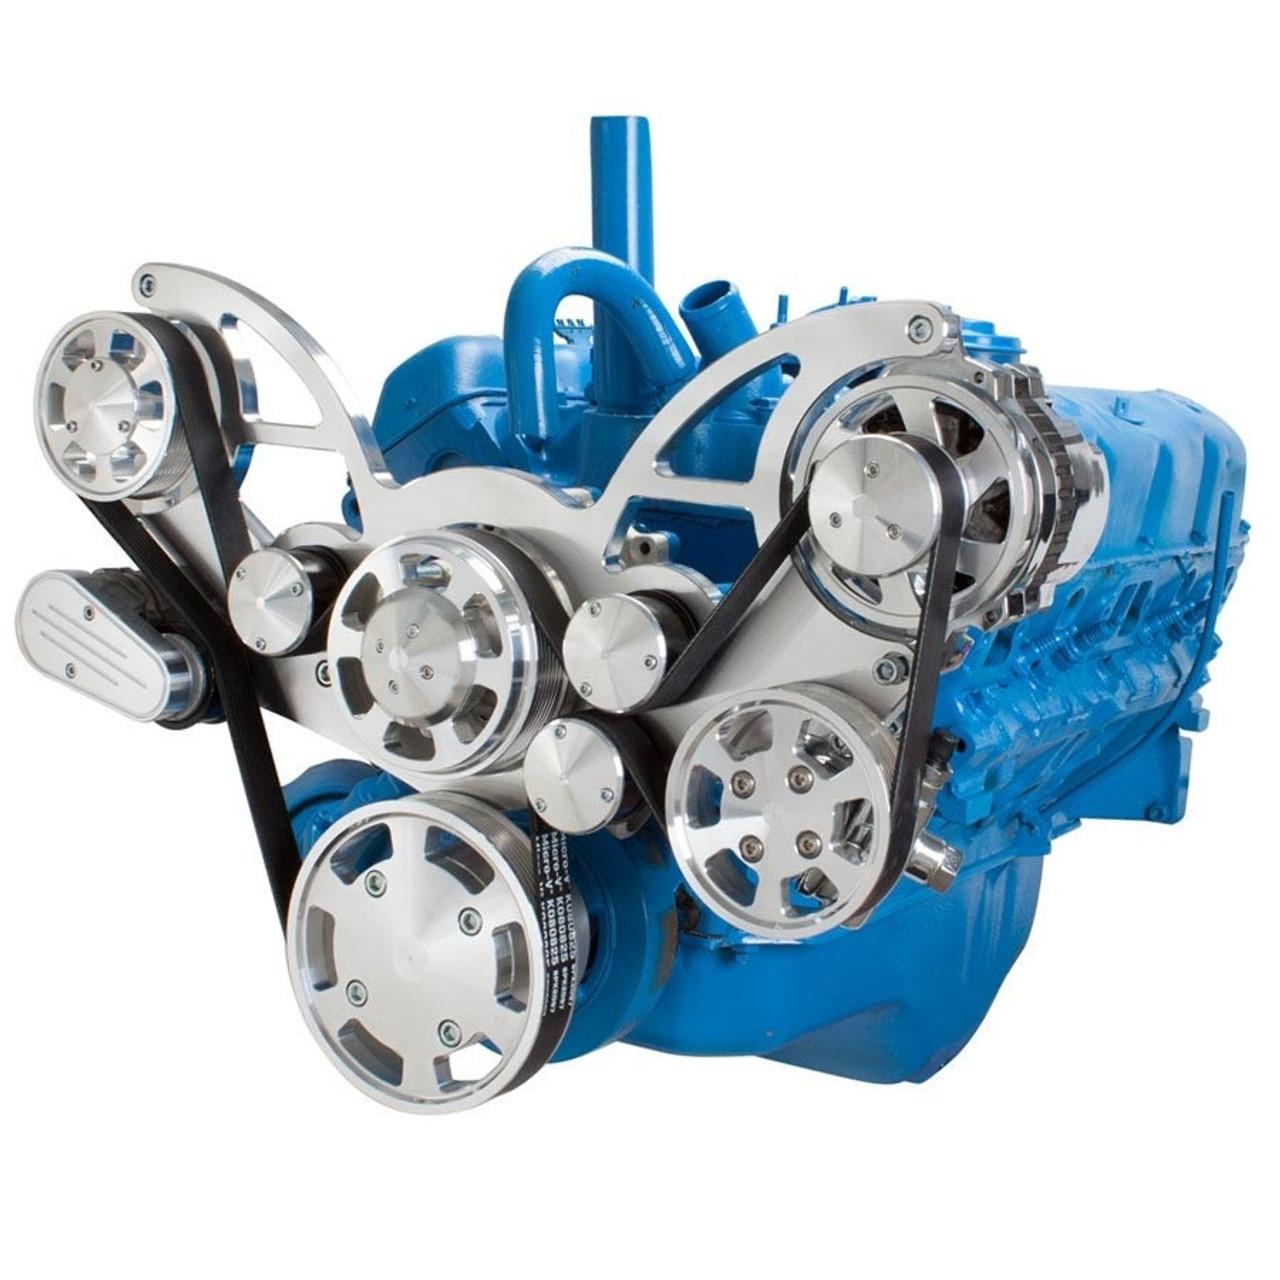 medium resolution of serpentine system for amc jeep 306 360 401 power steering alternator